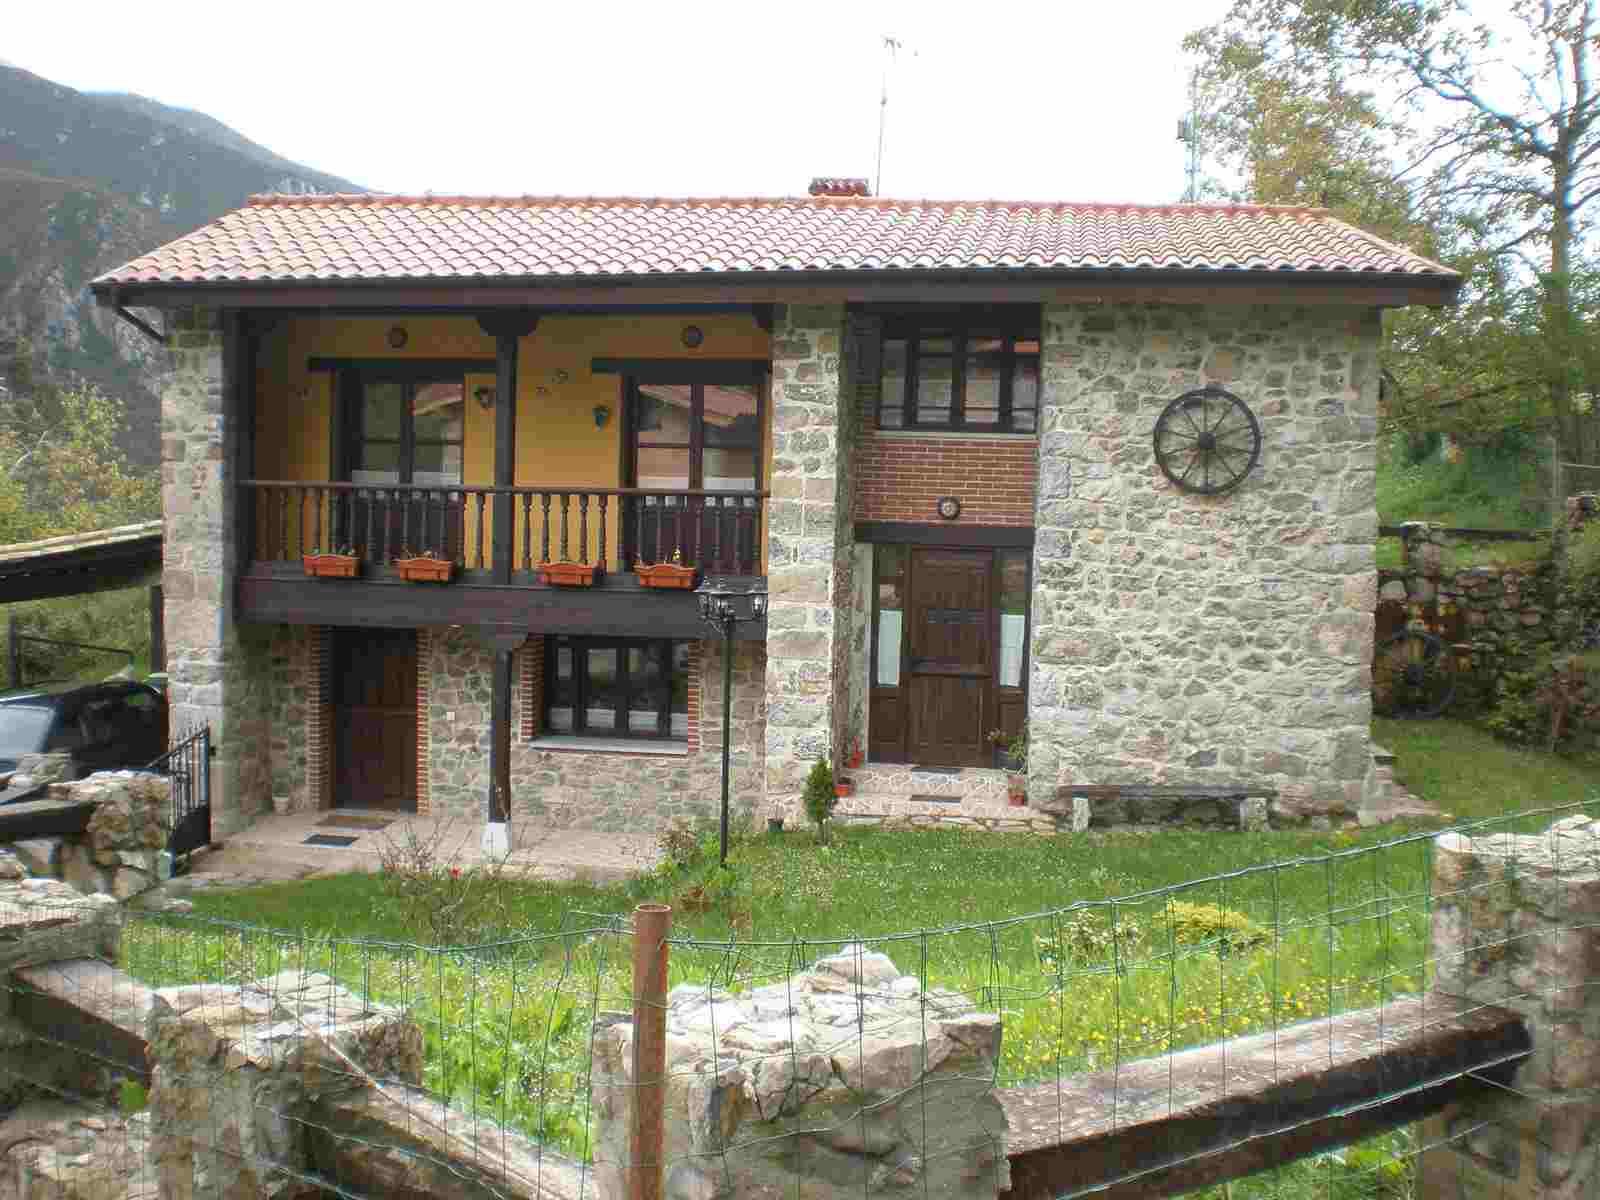 Alquiler vacacional en Socueva, Asturias